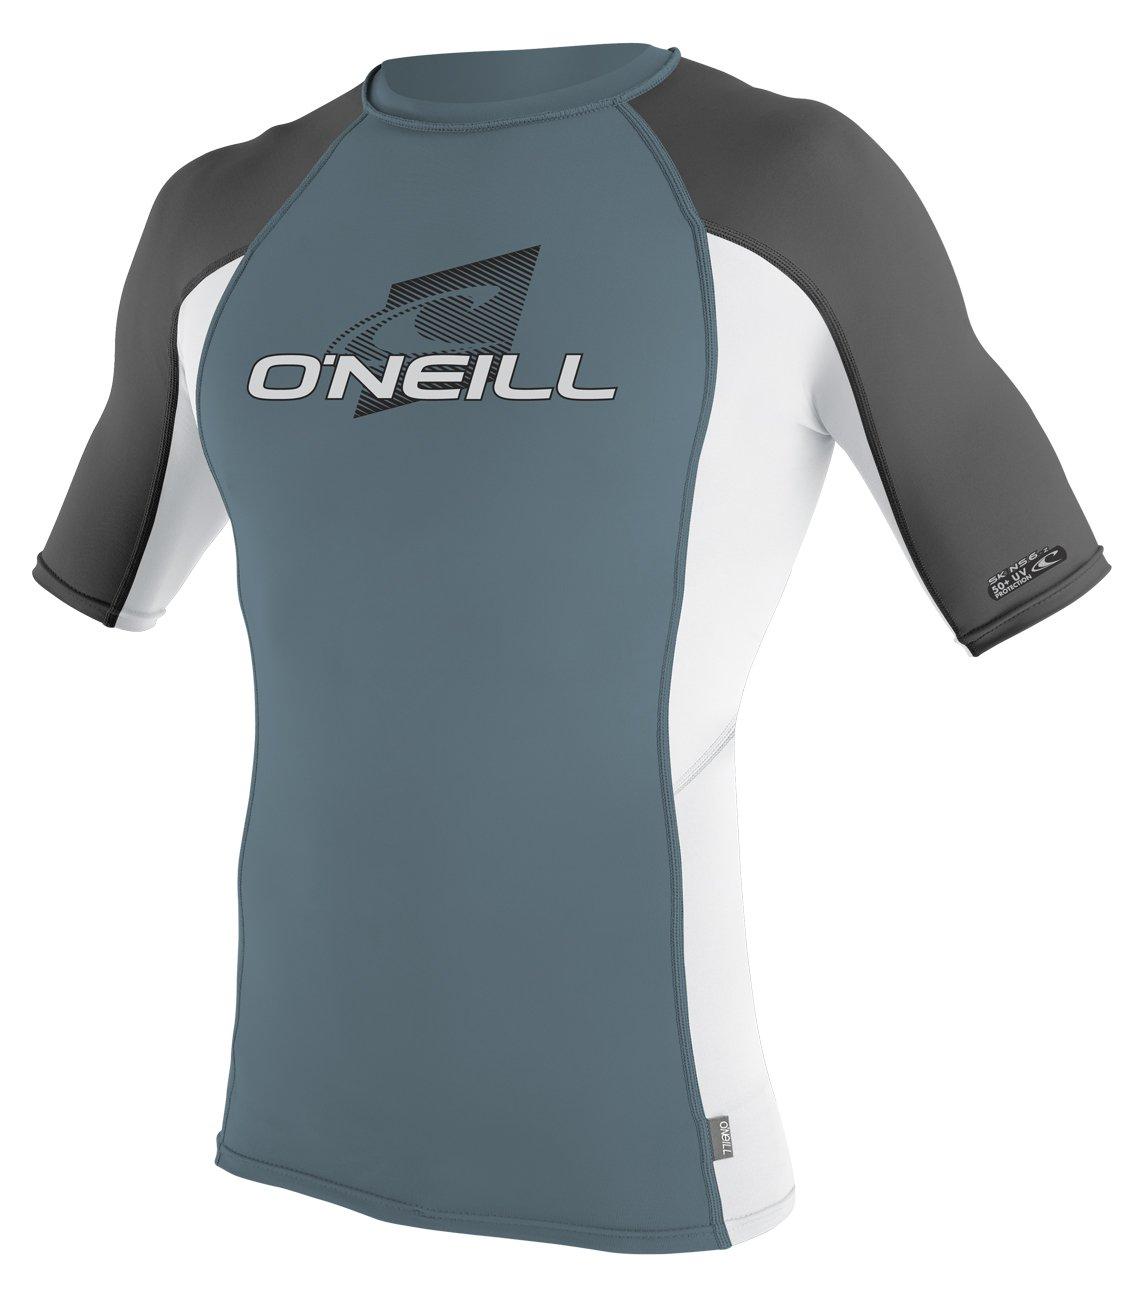 O'Neill Men's Premium Skins UPF 50+ Short Sleeve Rash Guard, Black/Lime/Blue, Small by O'Neill Wetsuits